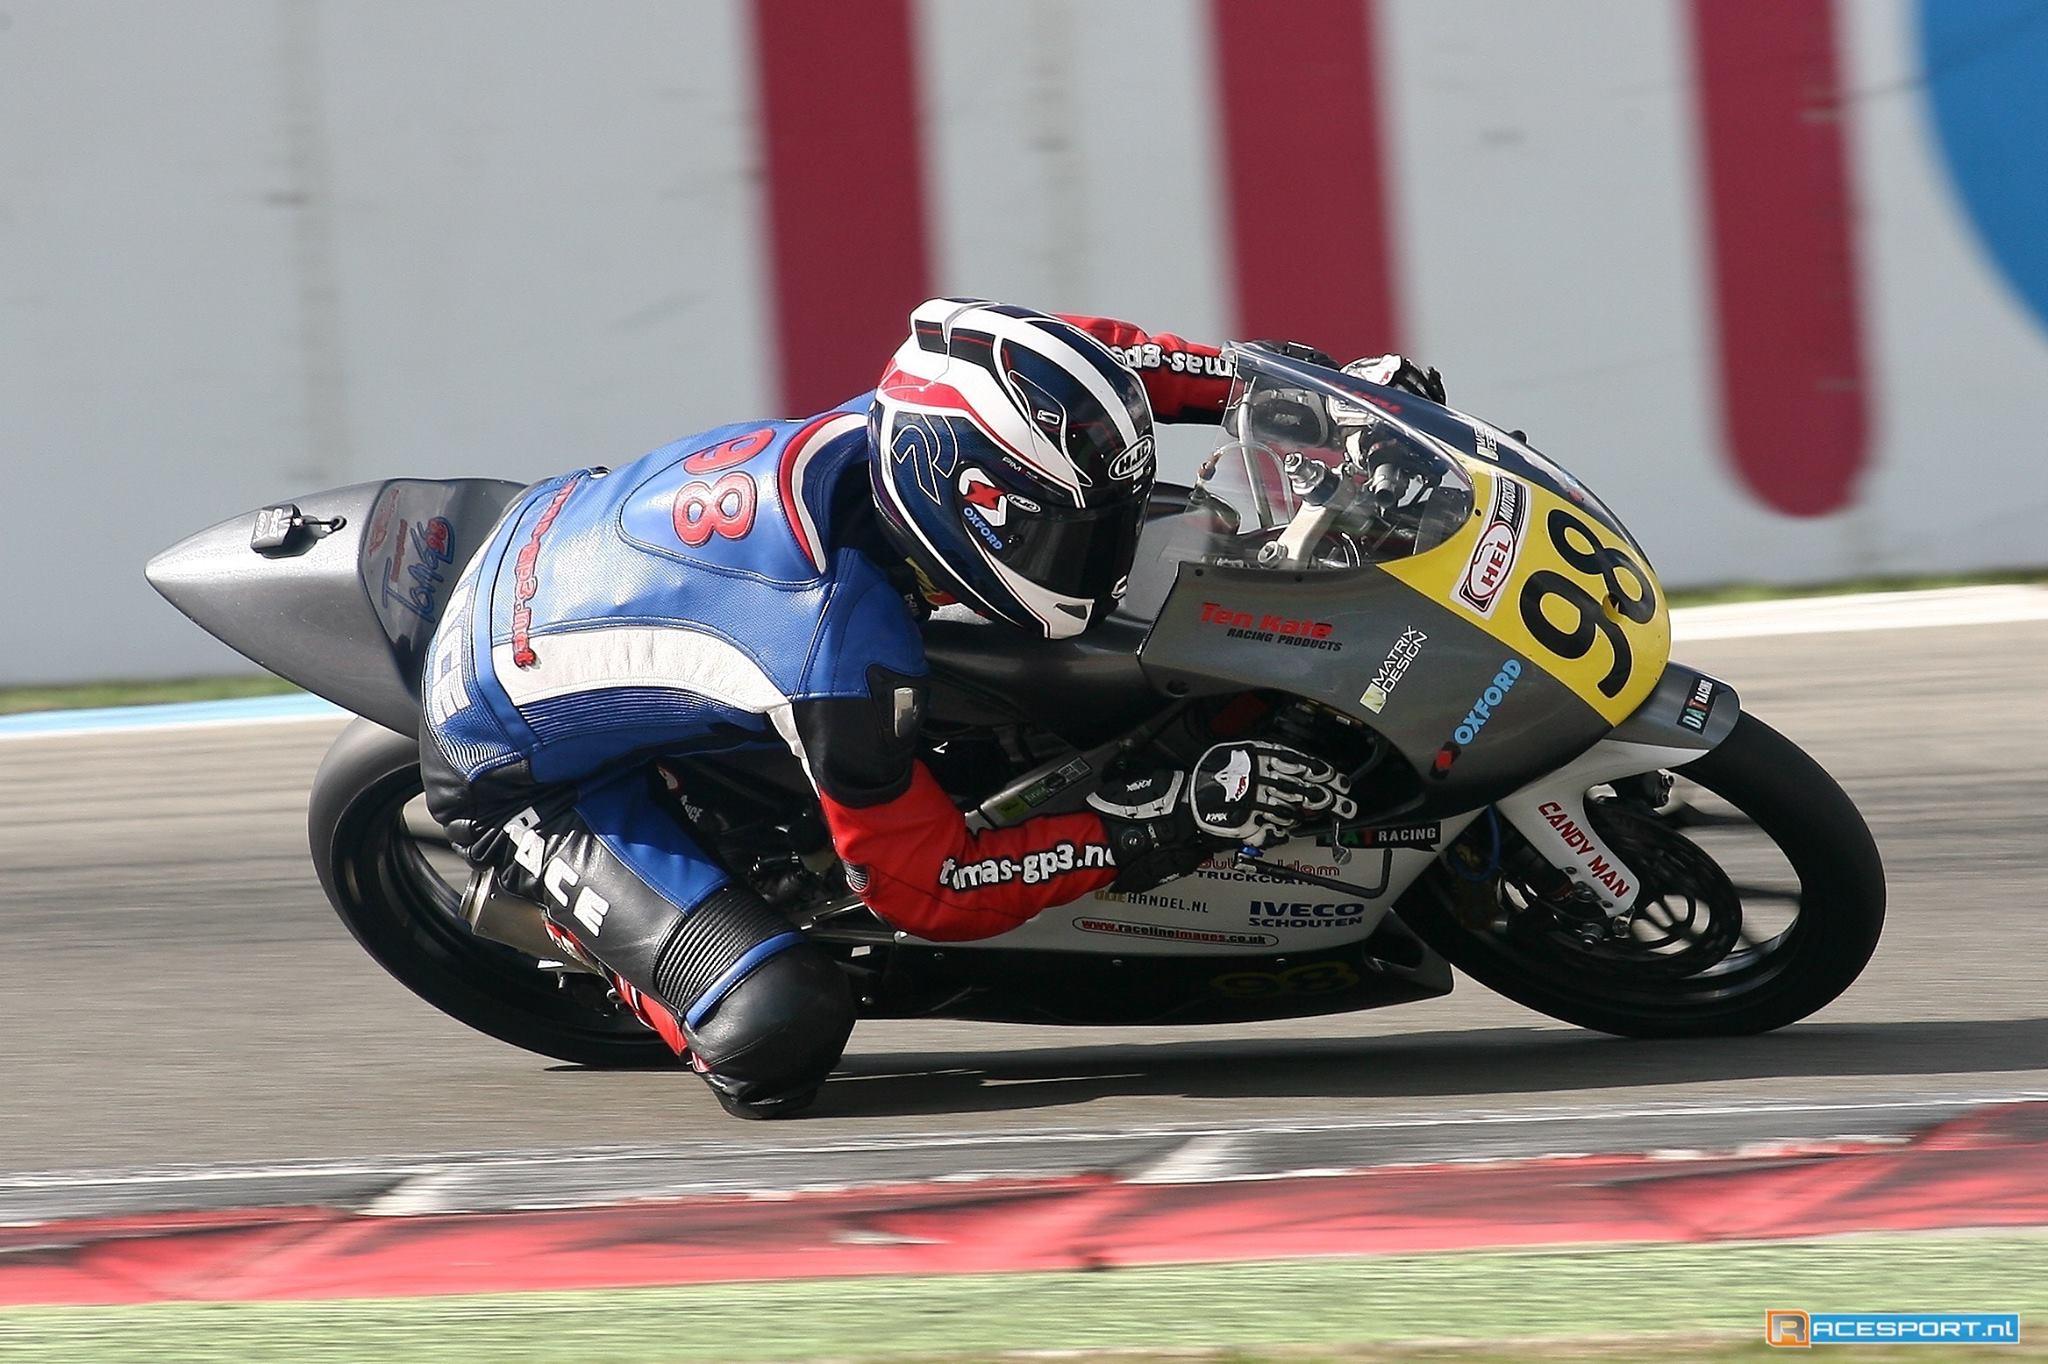 Hard pushend de laatste bocht in! Foto credit Racesport.nl